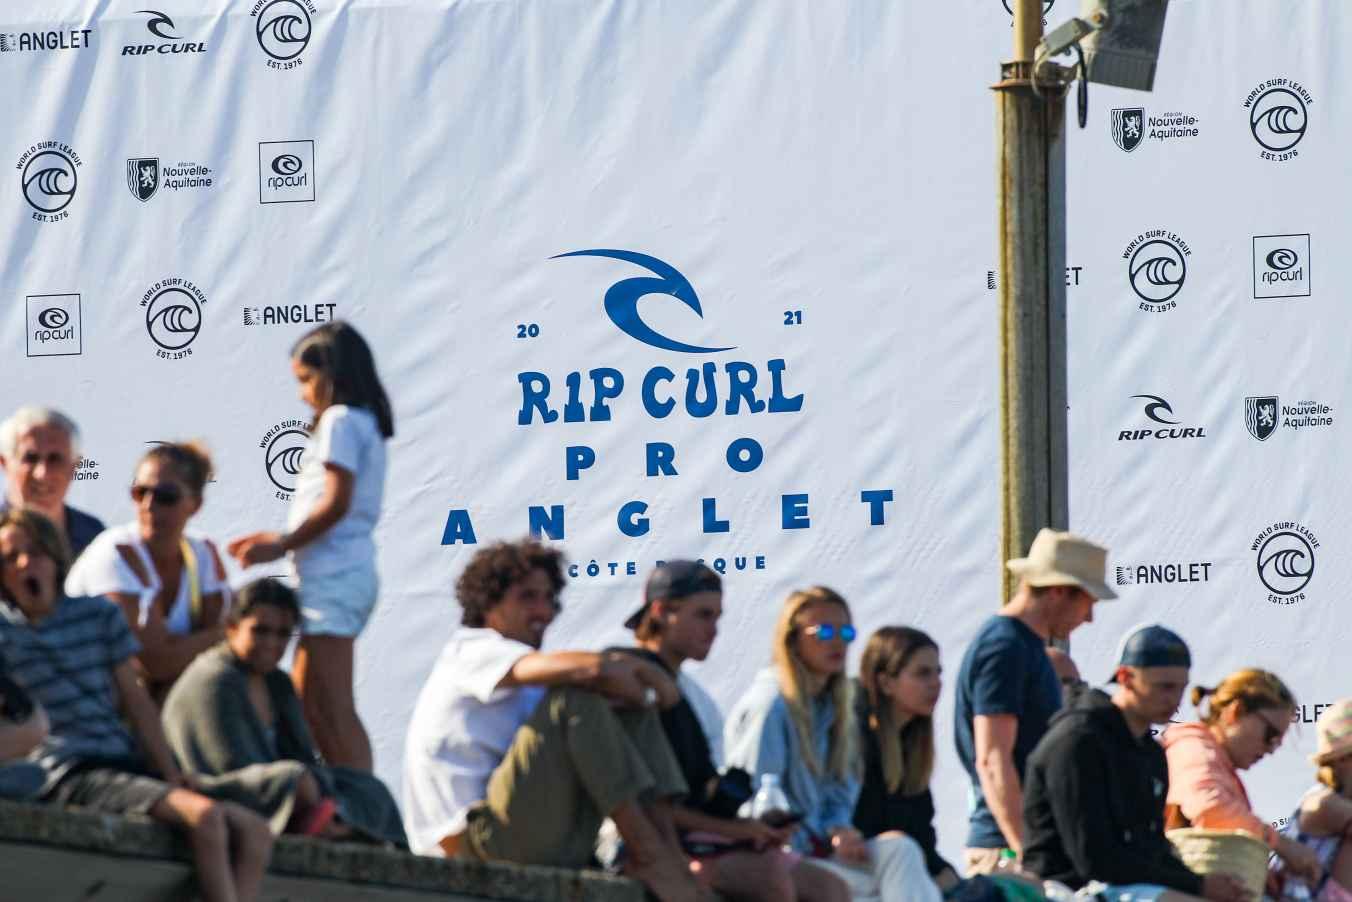 rip curl pro anglet surf30 Anglet Contest site5971AngletPro2021Masurel